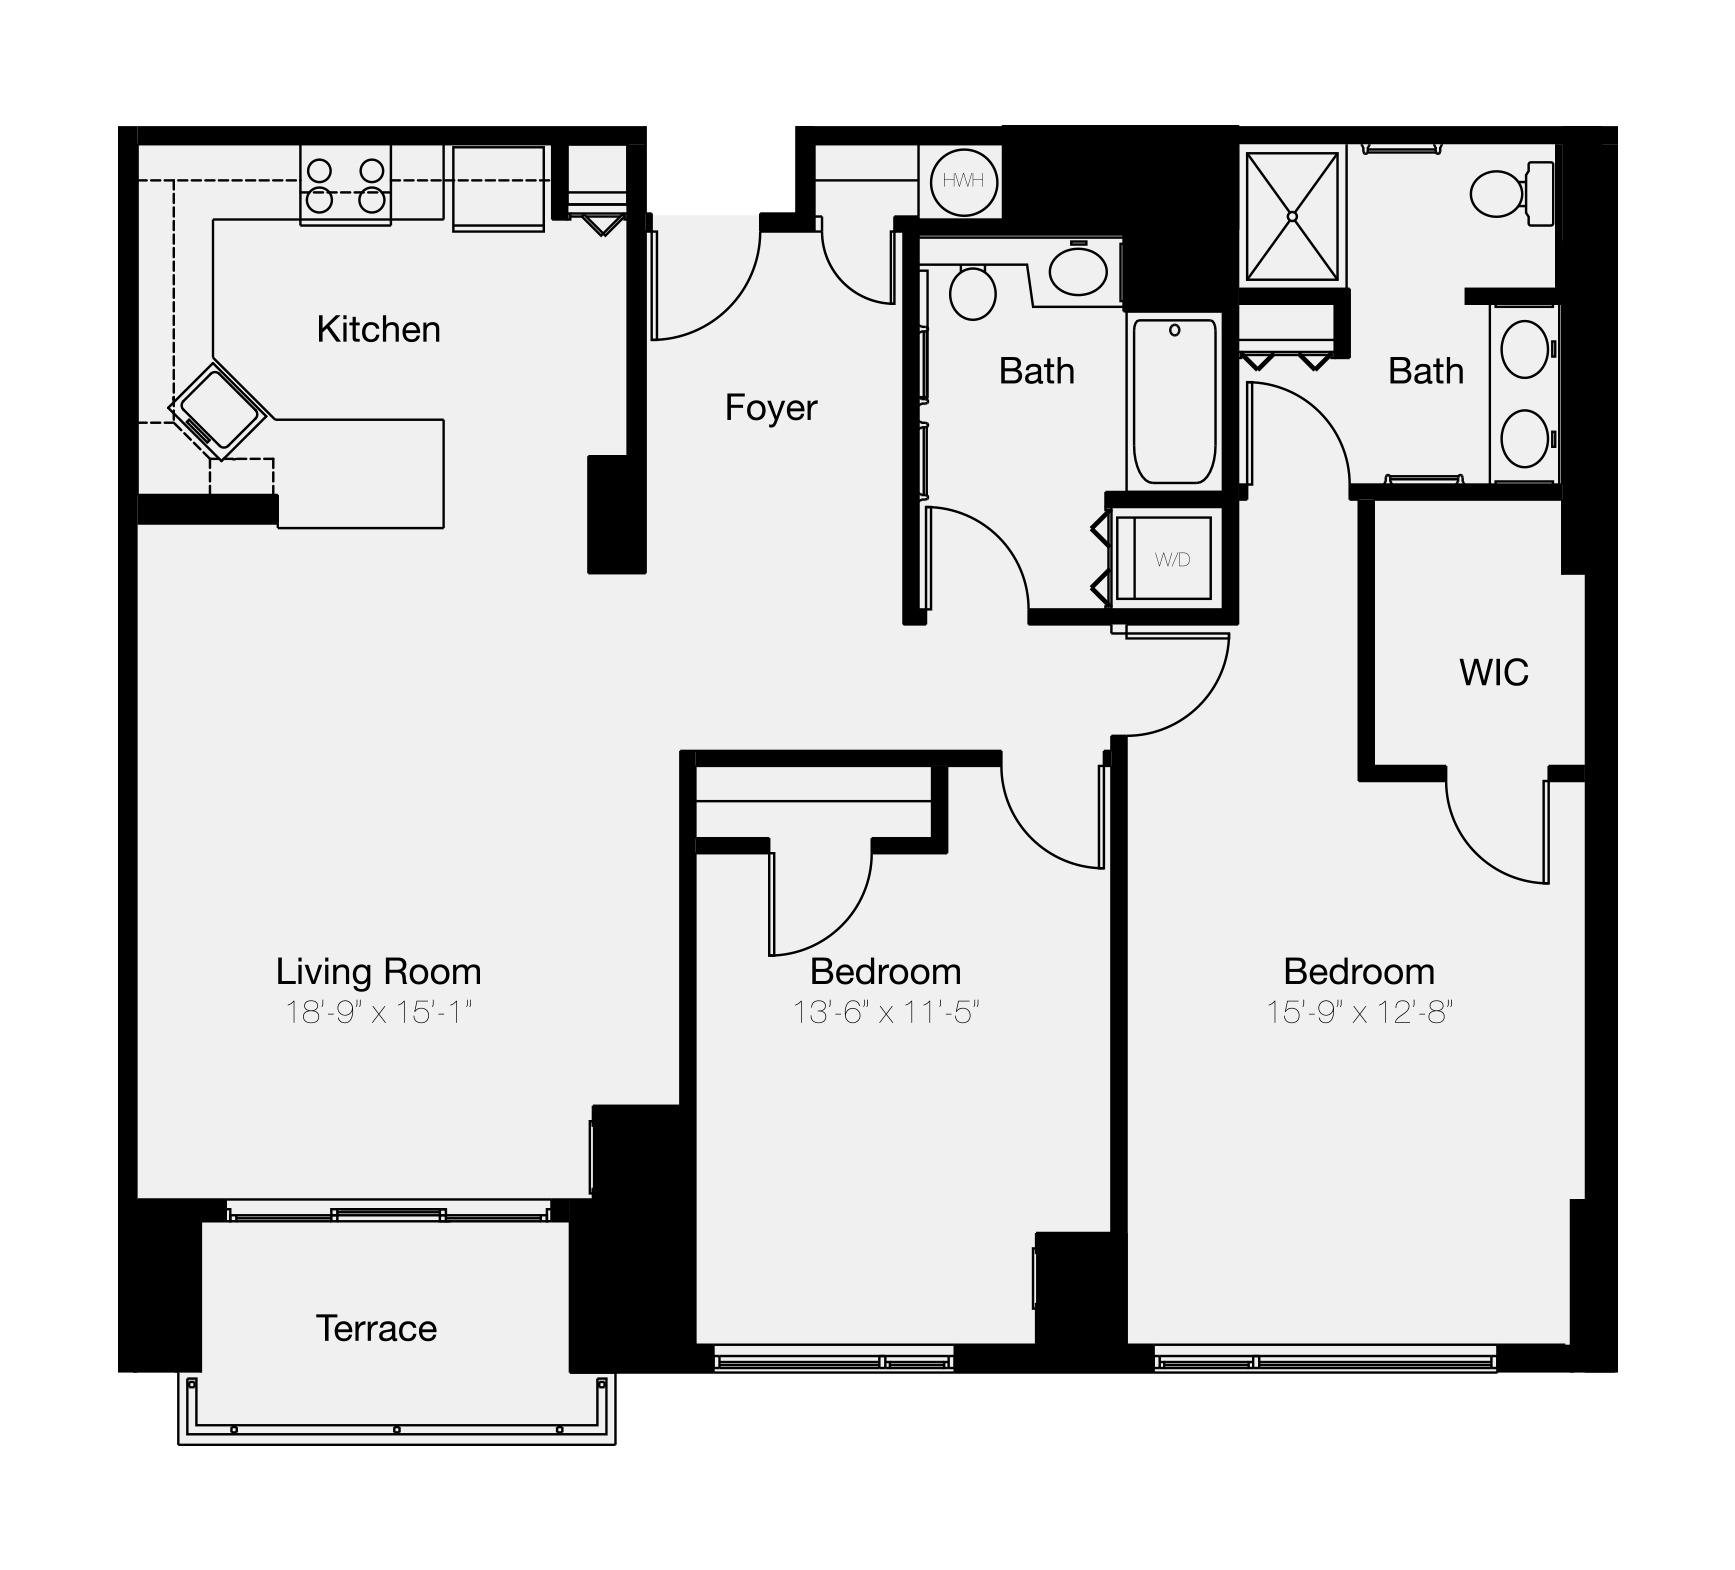 Two-bedroom floor plan of Philadelphia waterfront condo for sale